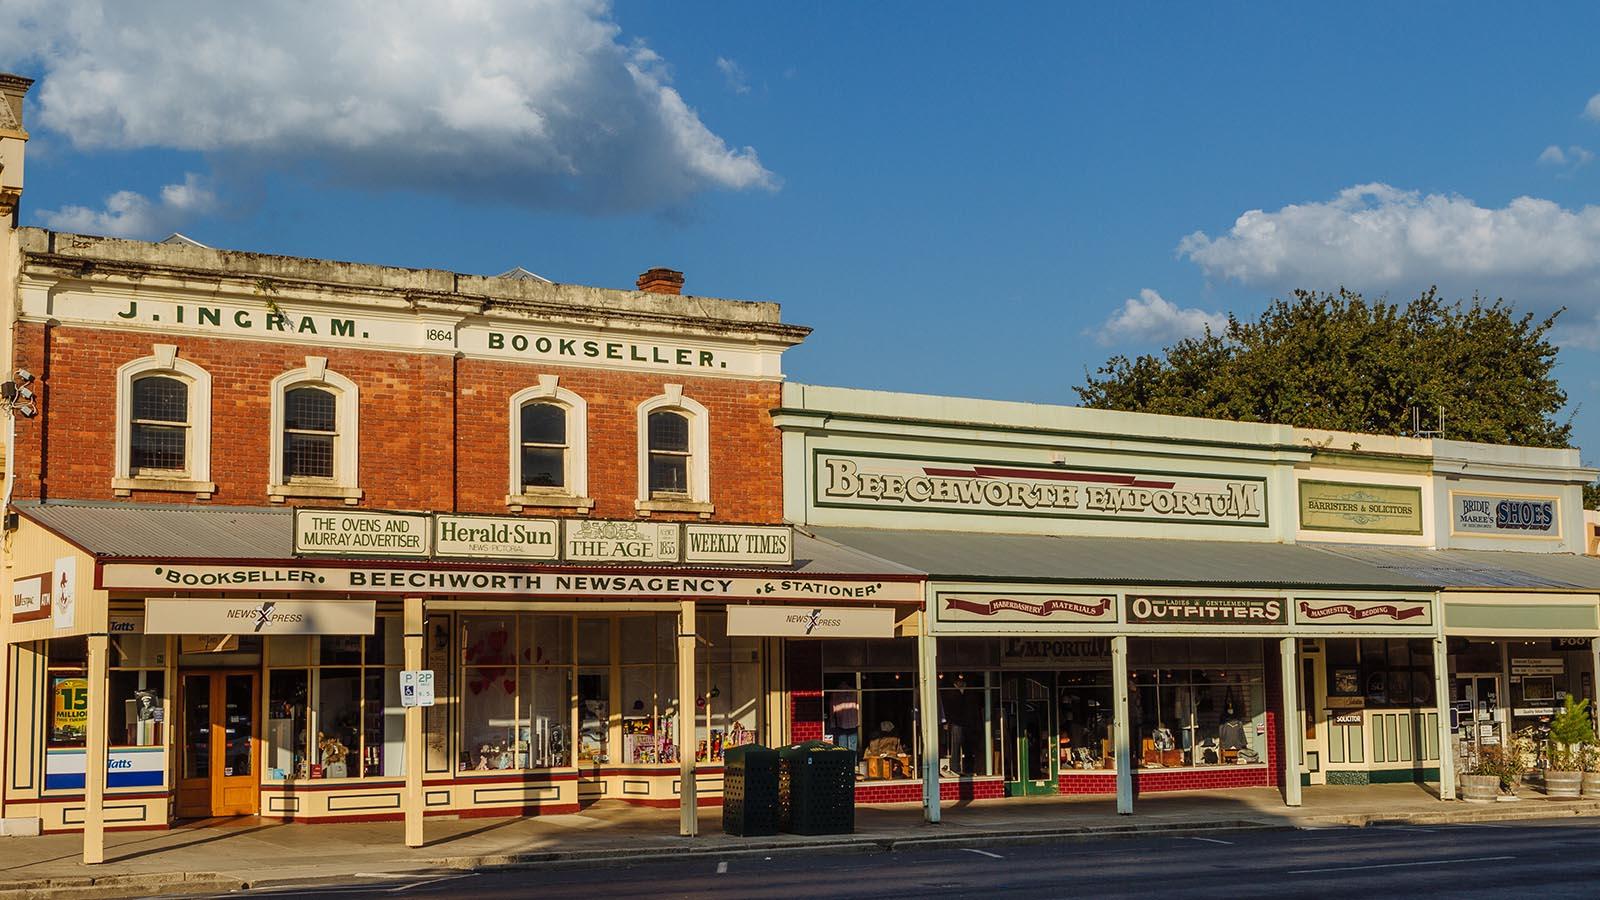 Beechworth streetscape, High Country, Victoria, Australia